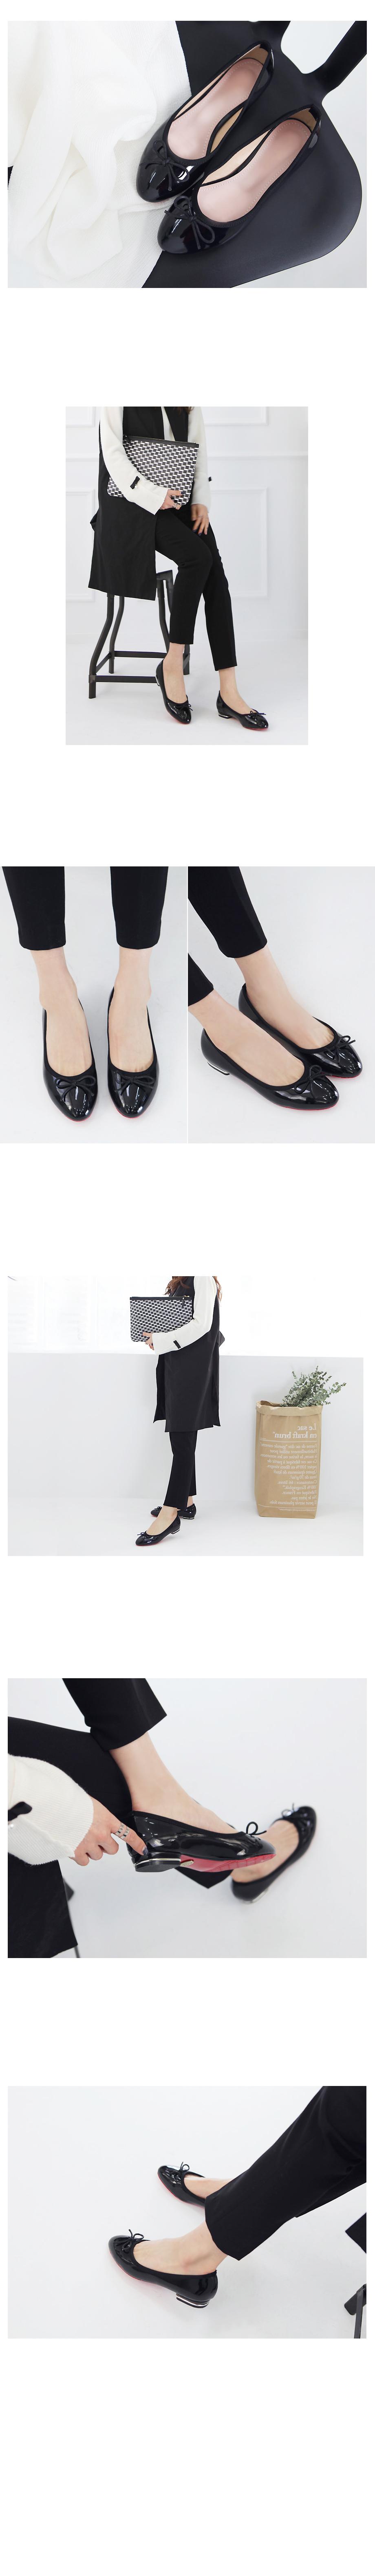 Effect Flat Shoes 2.5cm